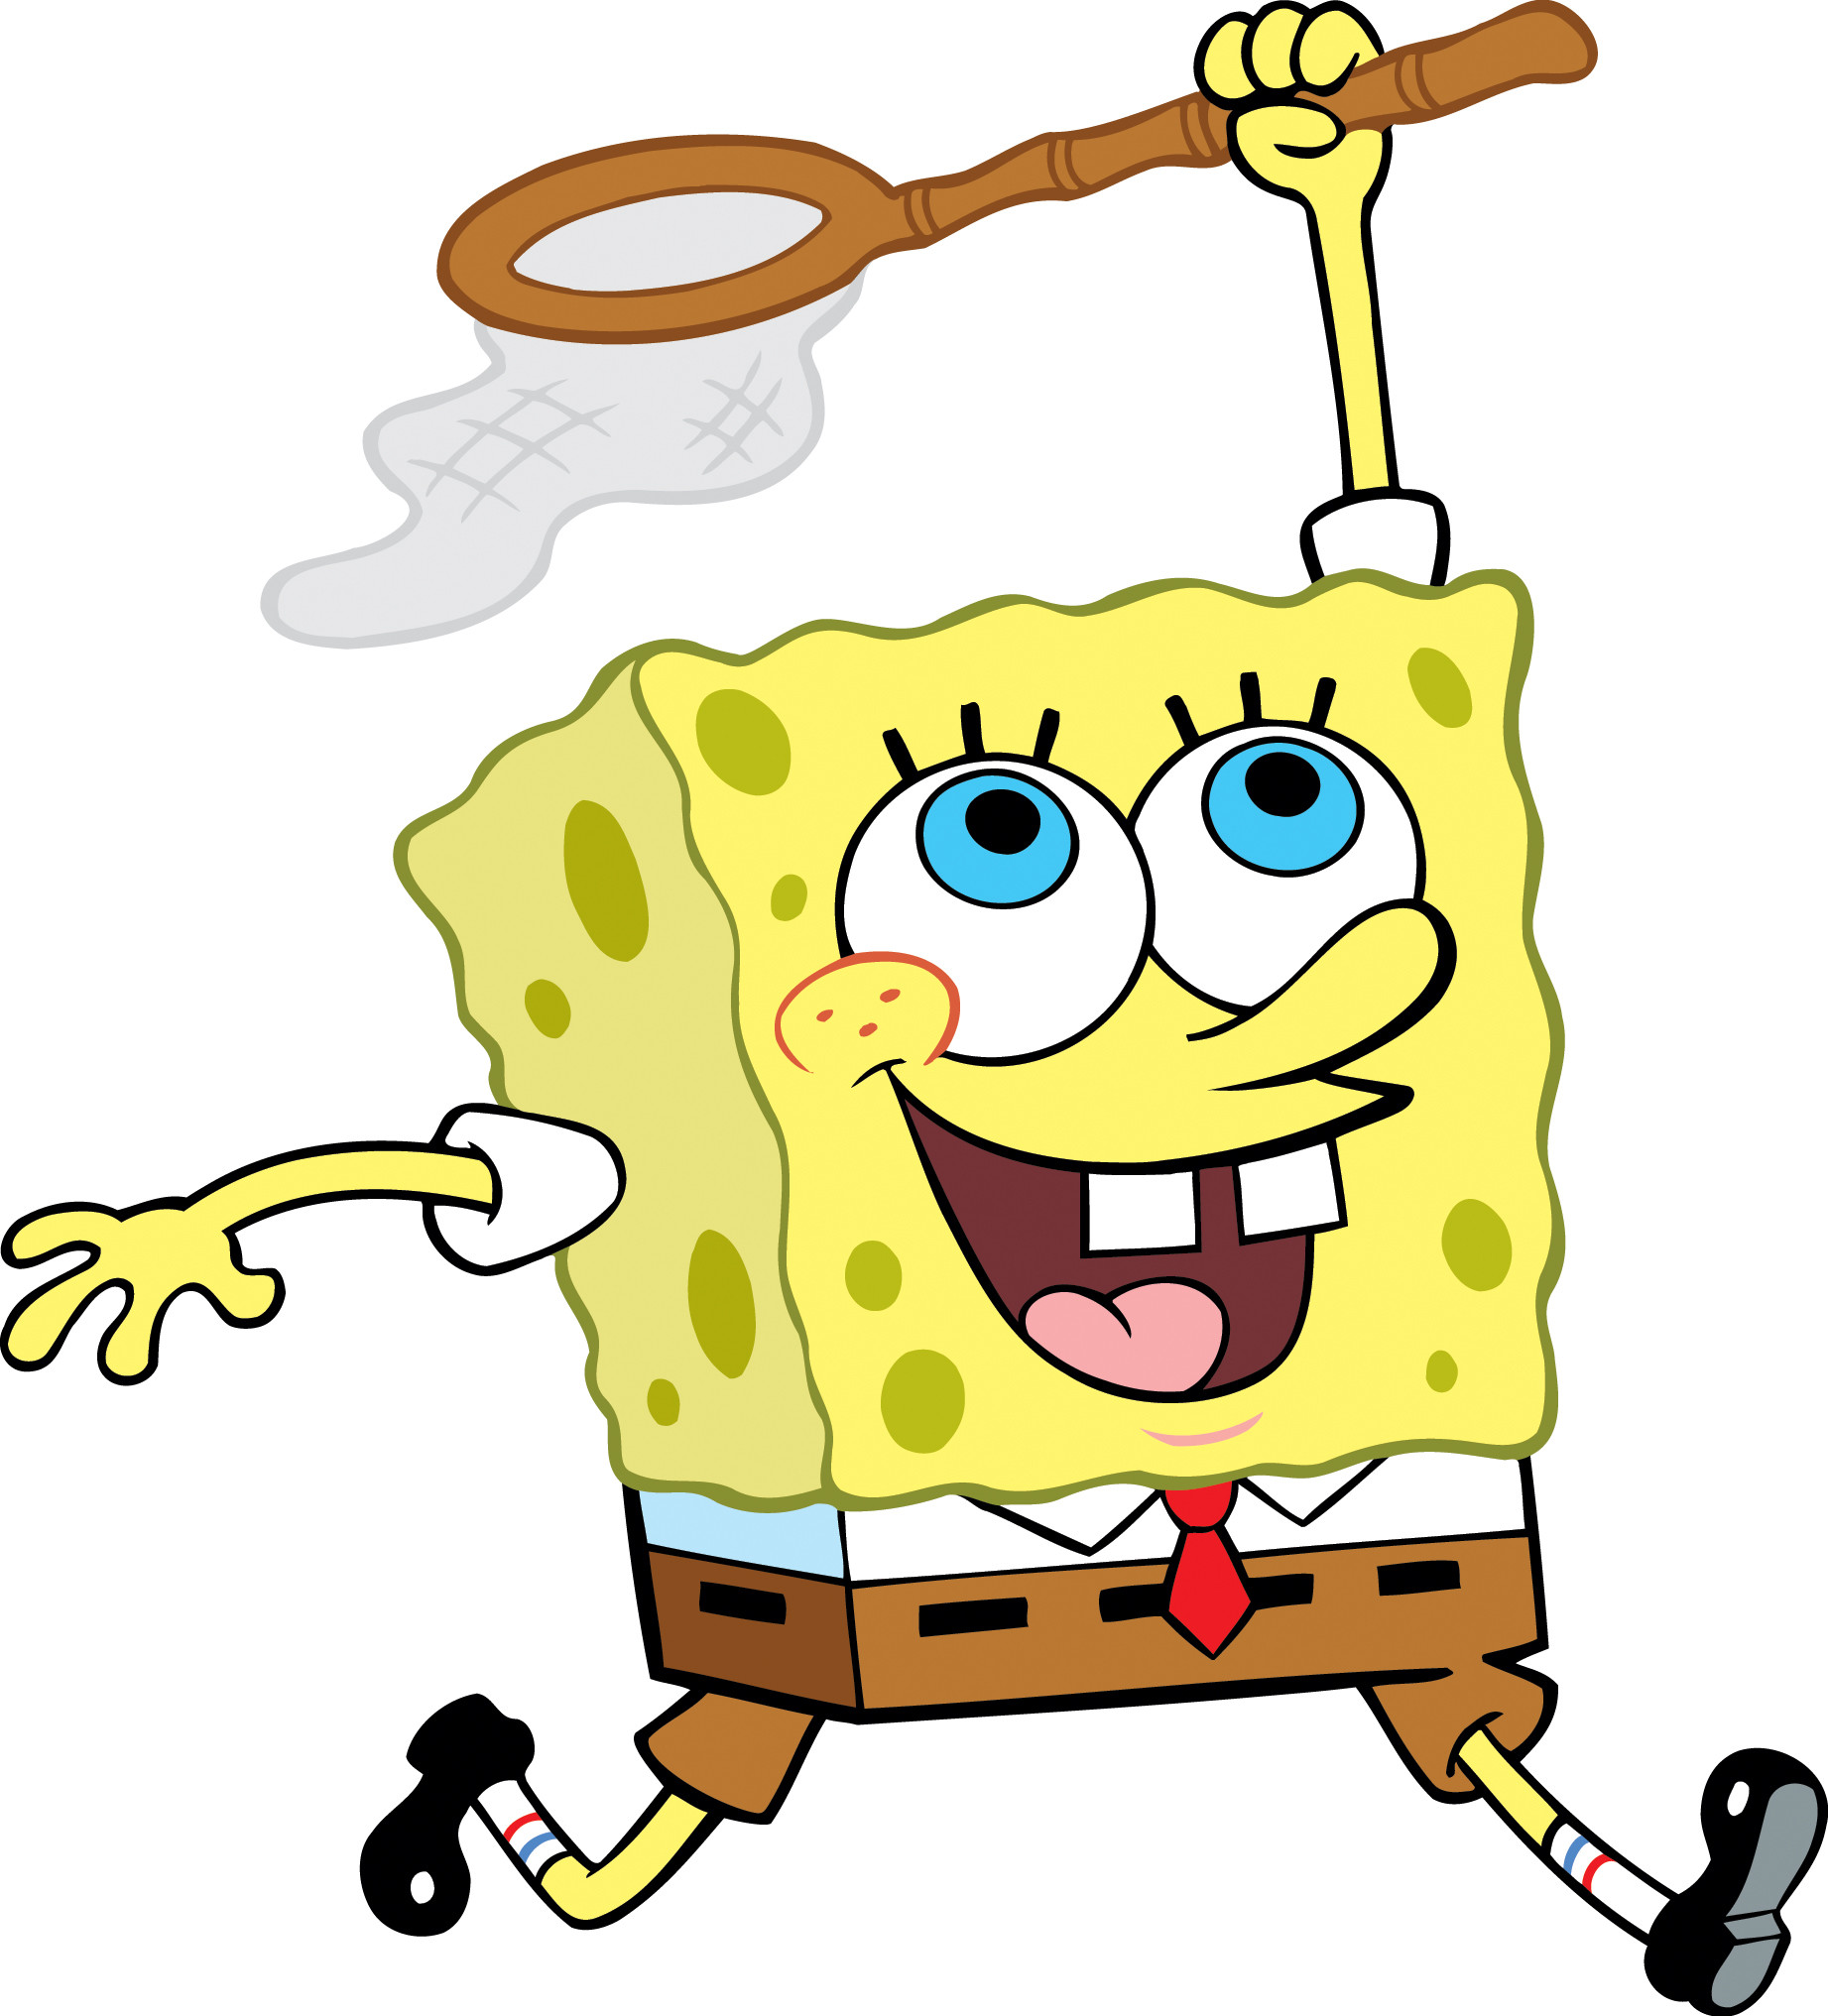 HD Wallpaper and background photos of Spongebob for fans of Spongebob  Squarepants images.